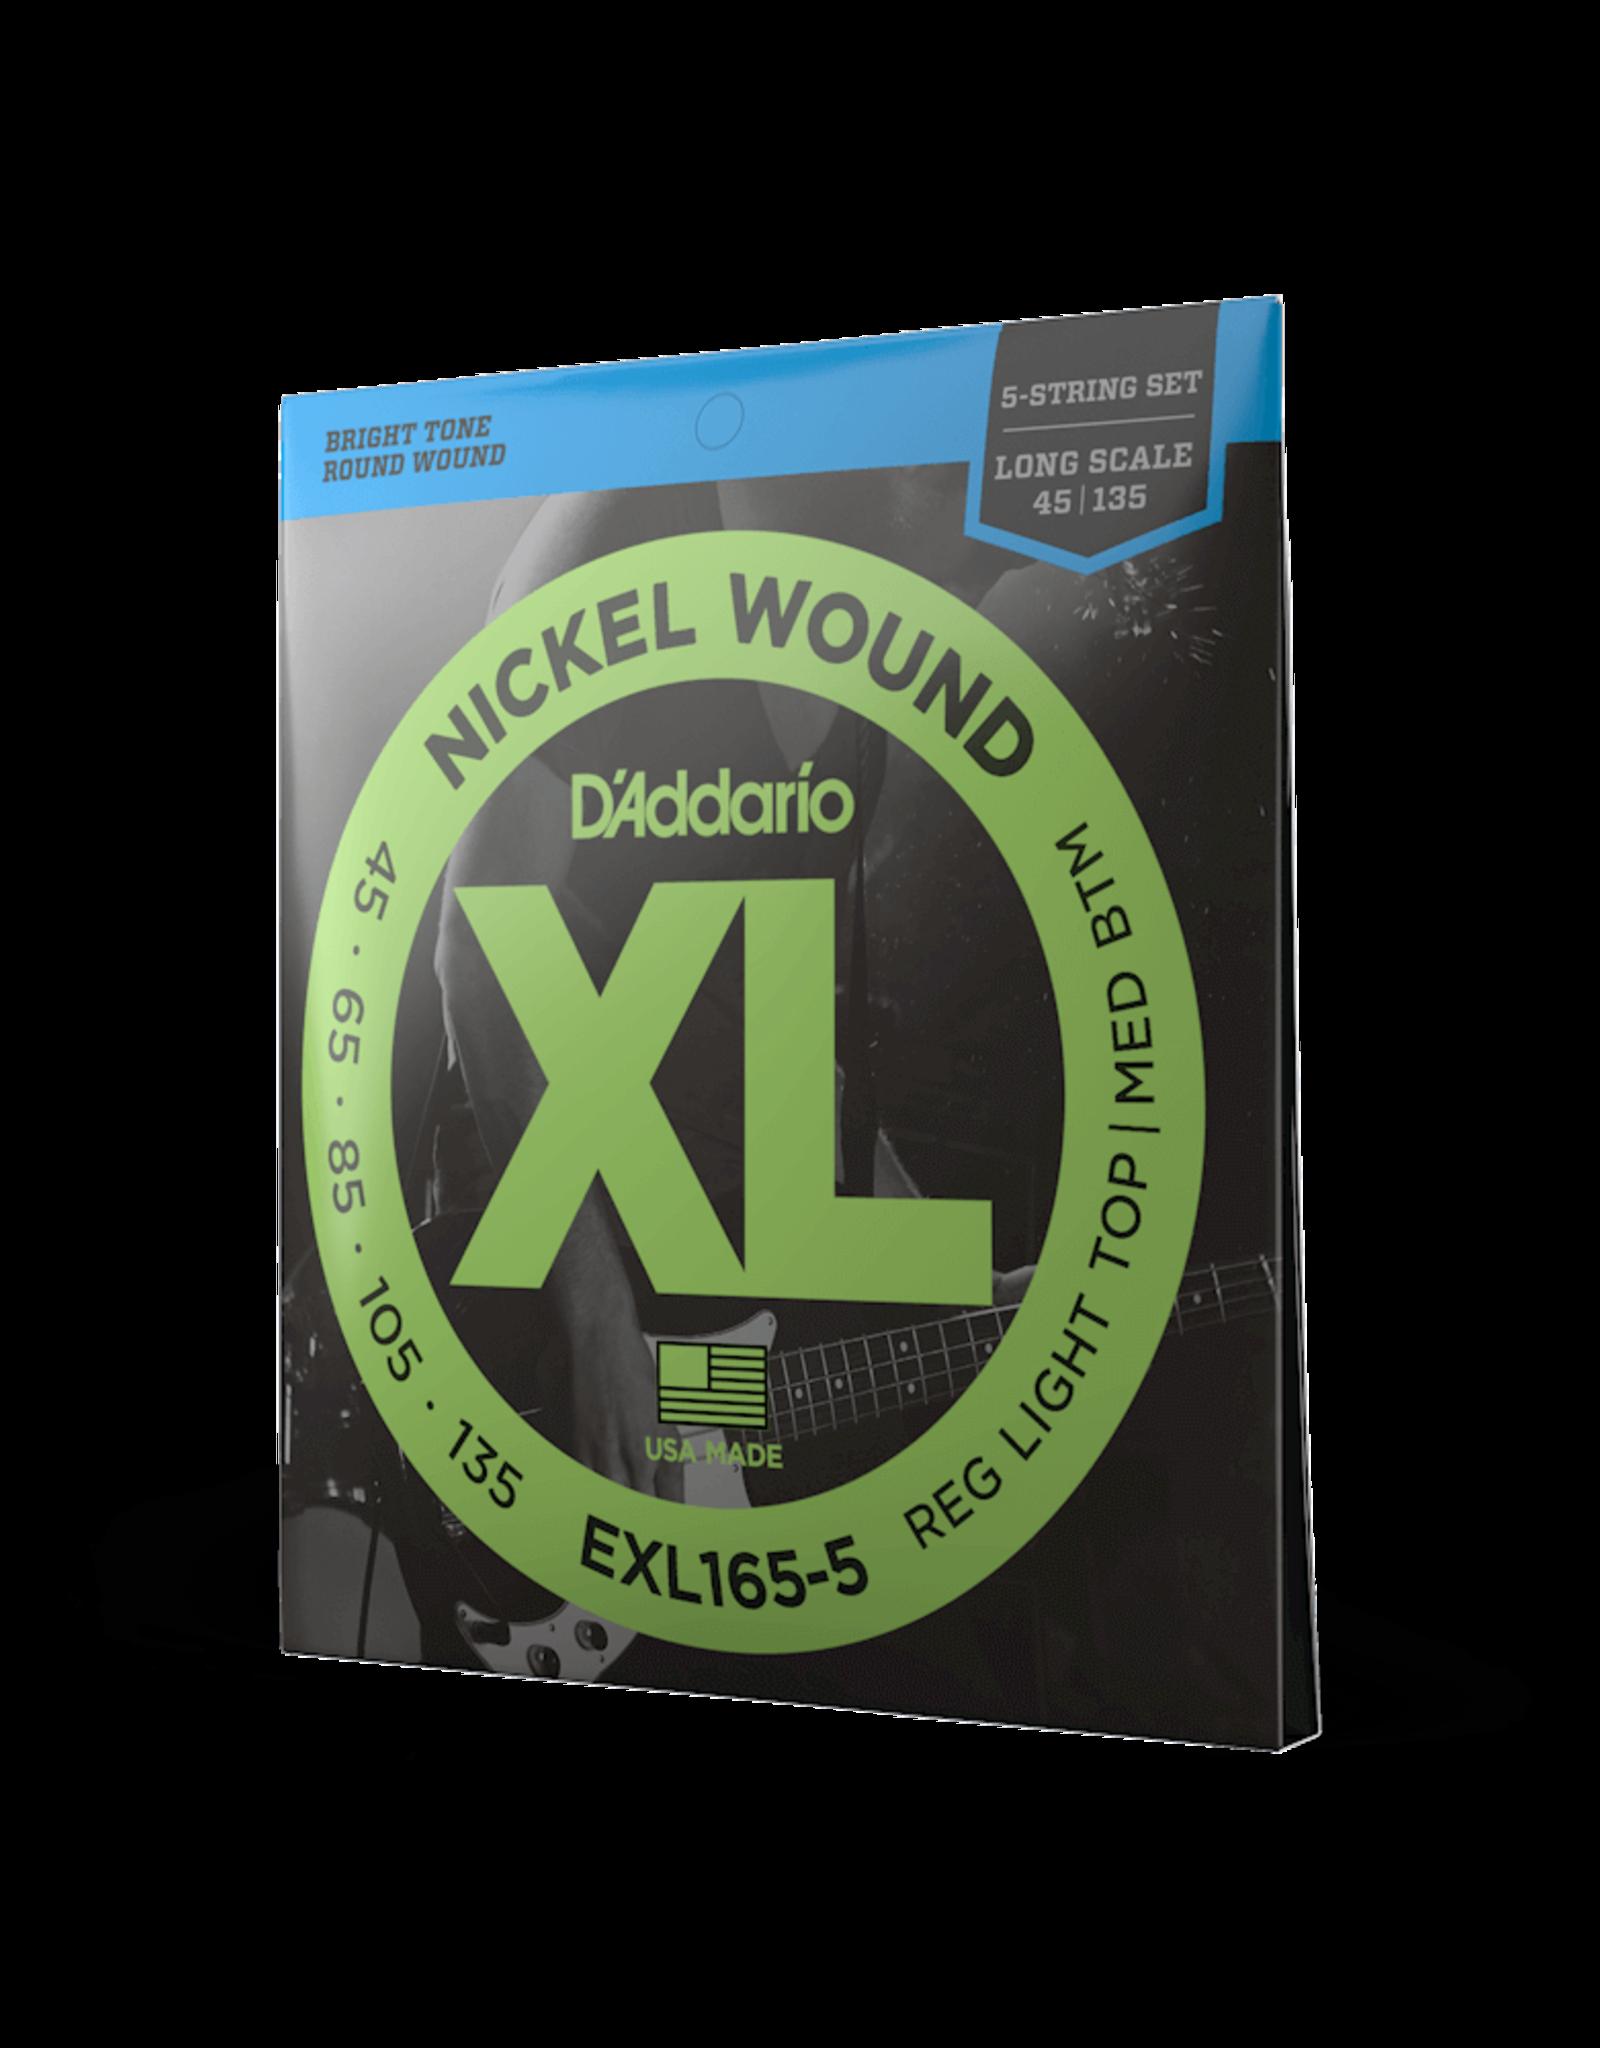 D'Addario D'Addario EXL165 5-String Nickel Wound Bass Guitar Strings, Custom Light, 45-135, Long Scale